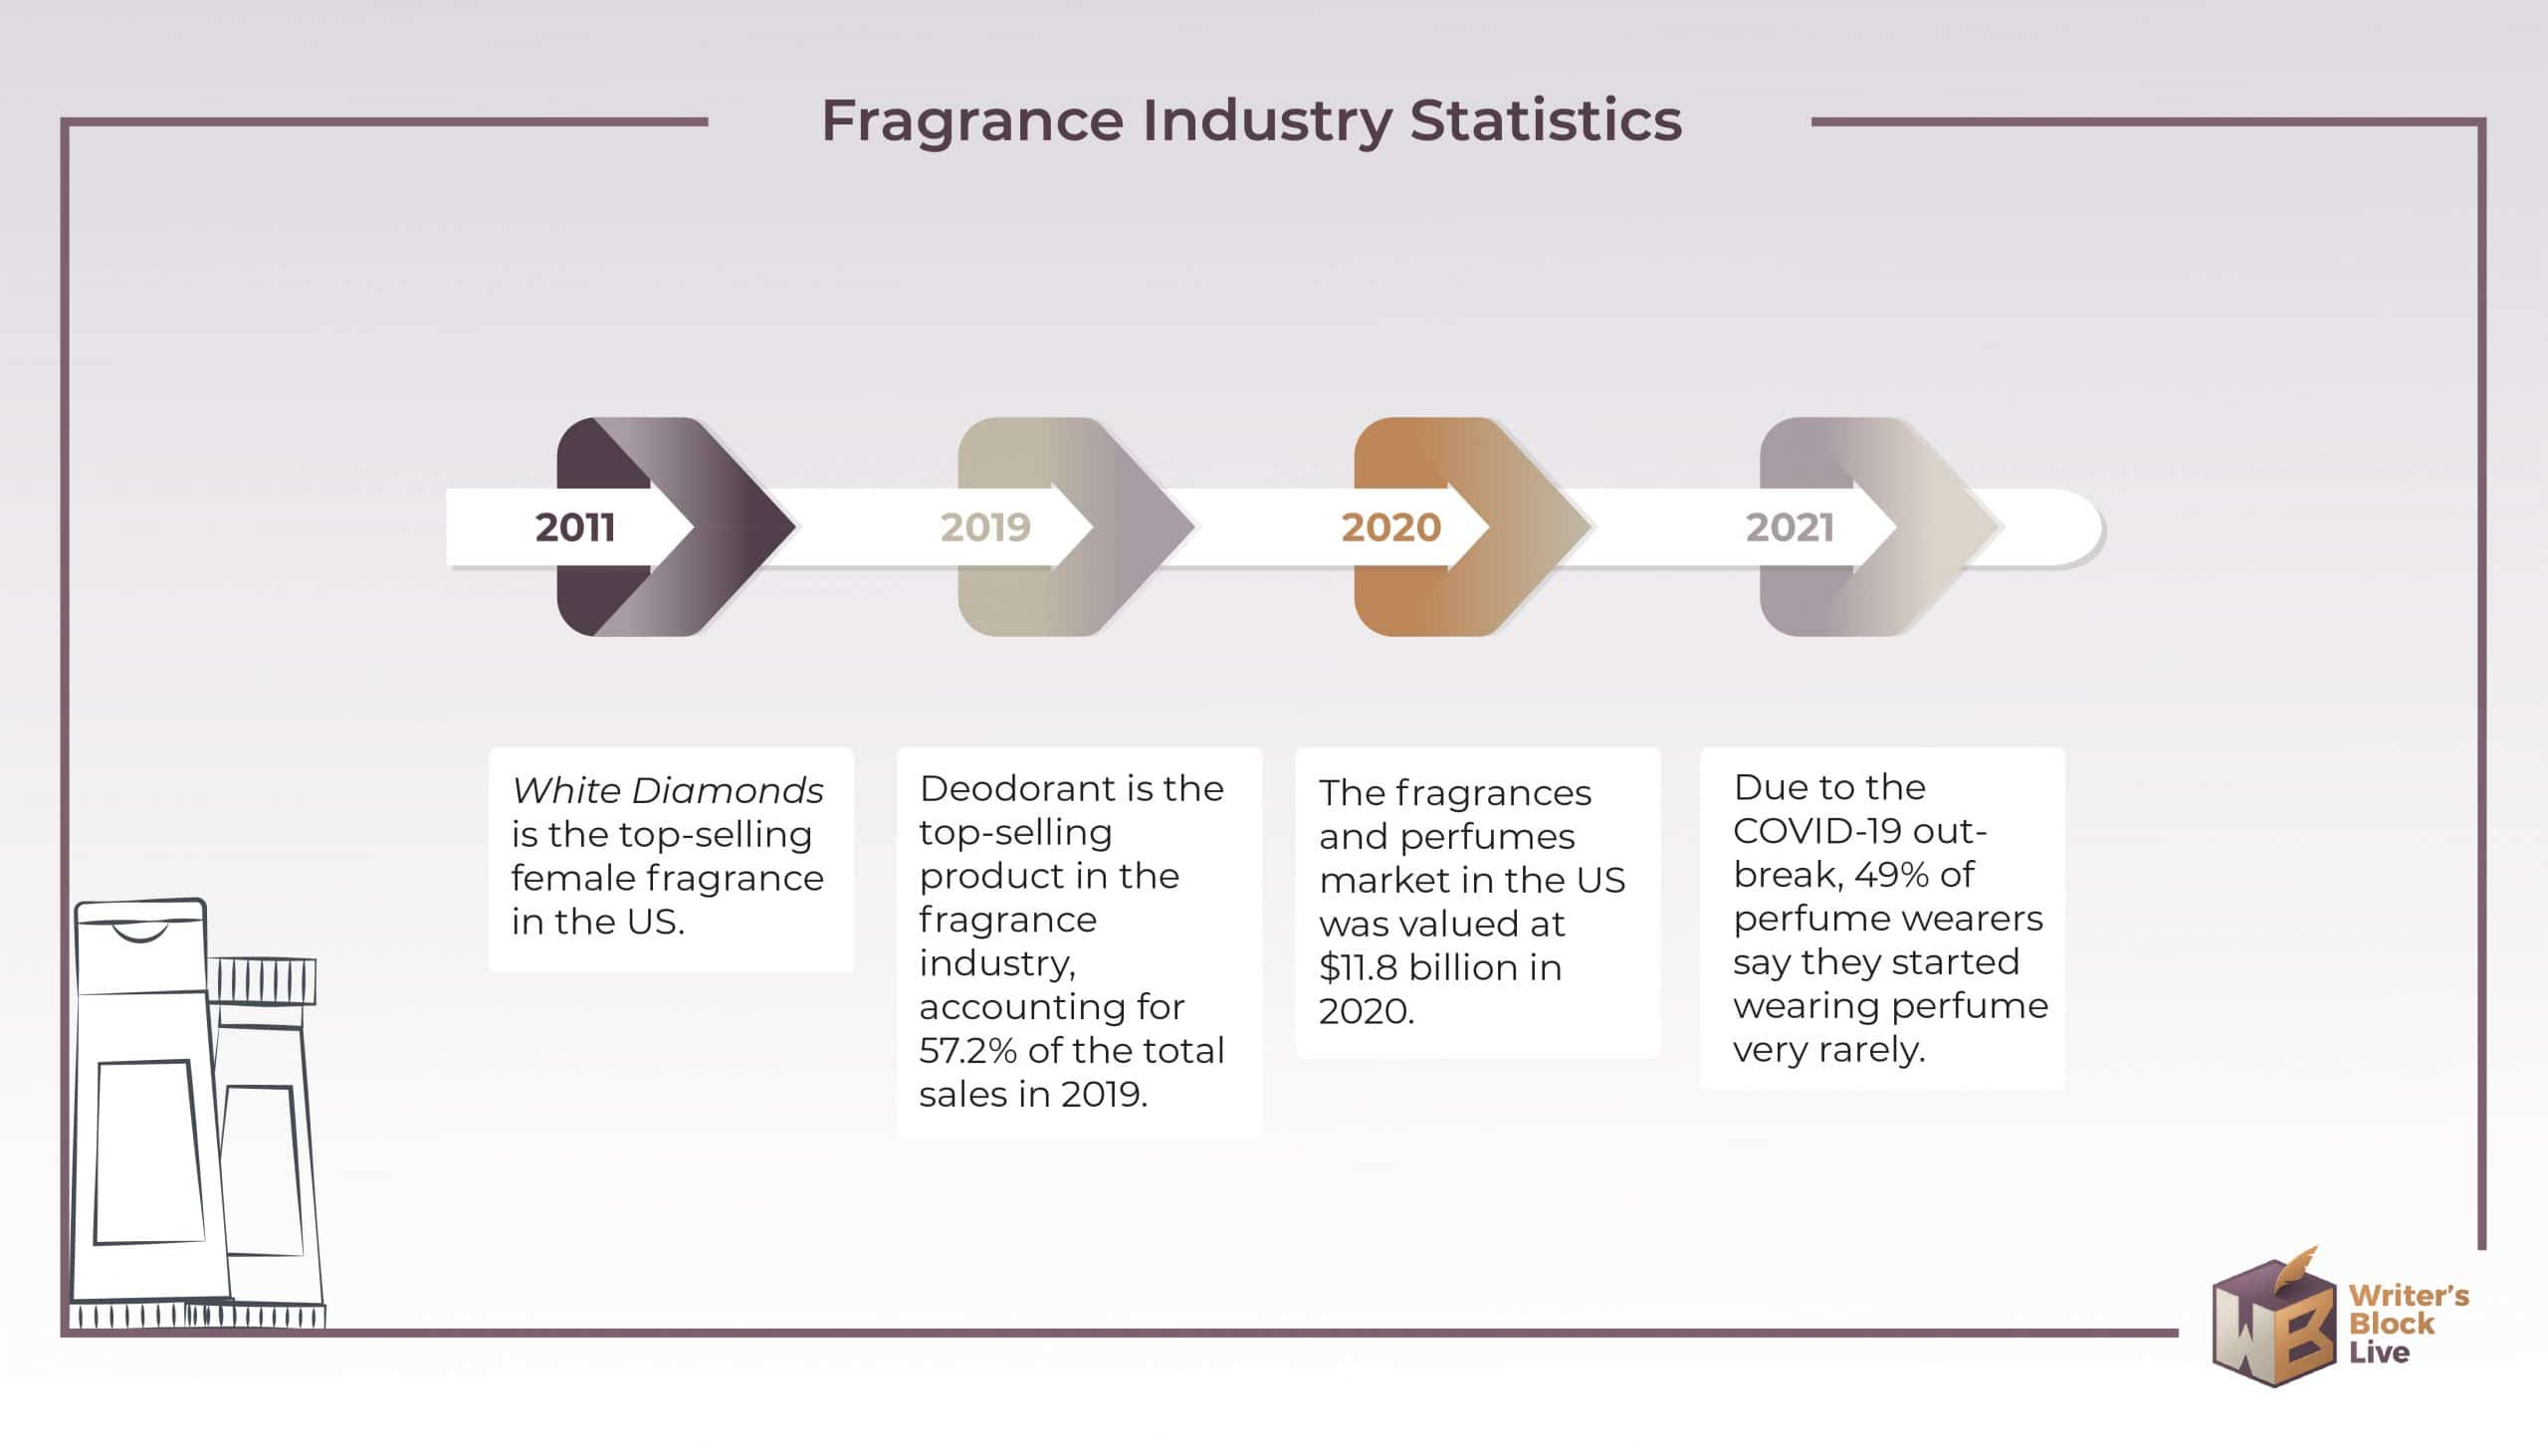 Fragrance Industry Statistics